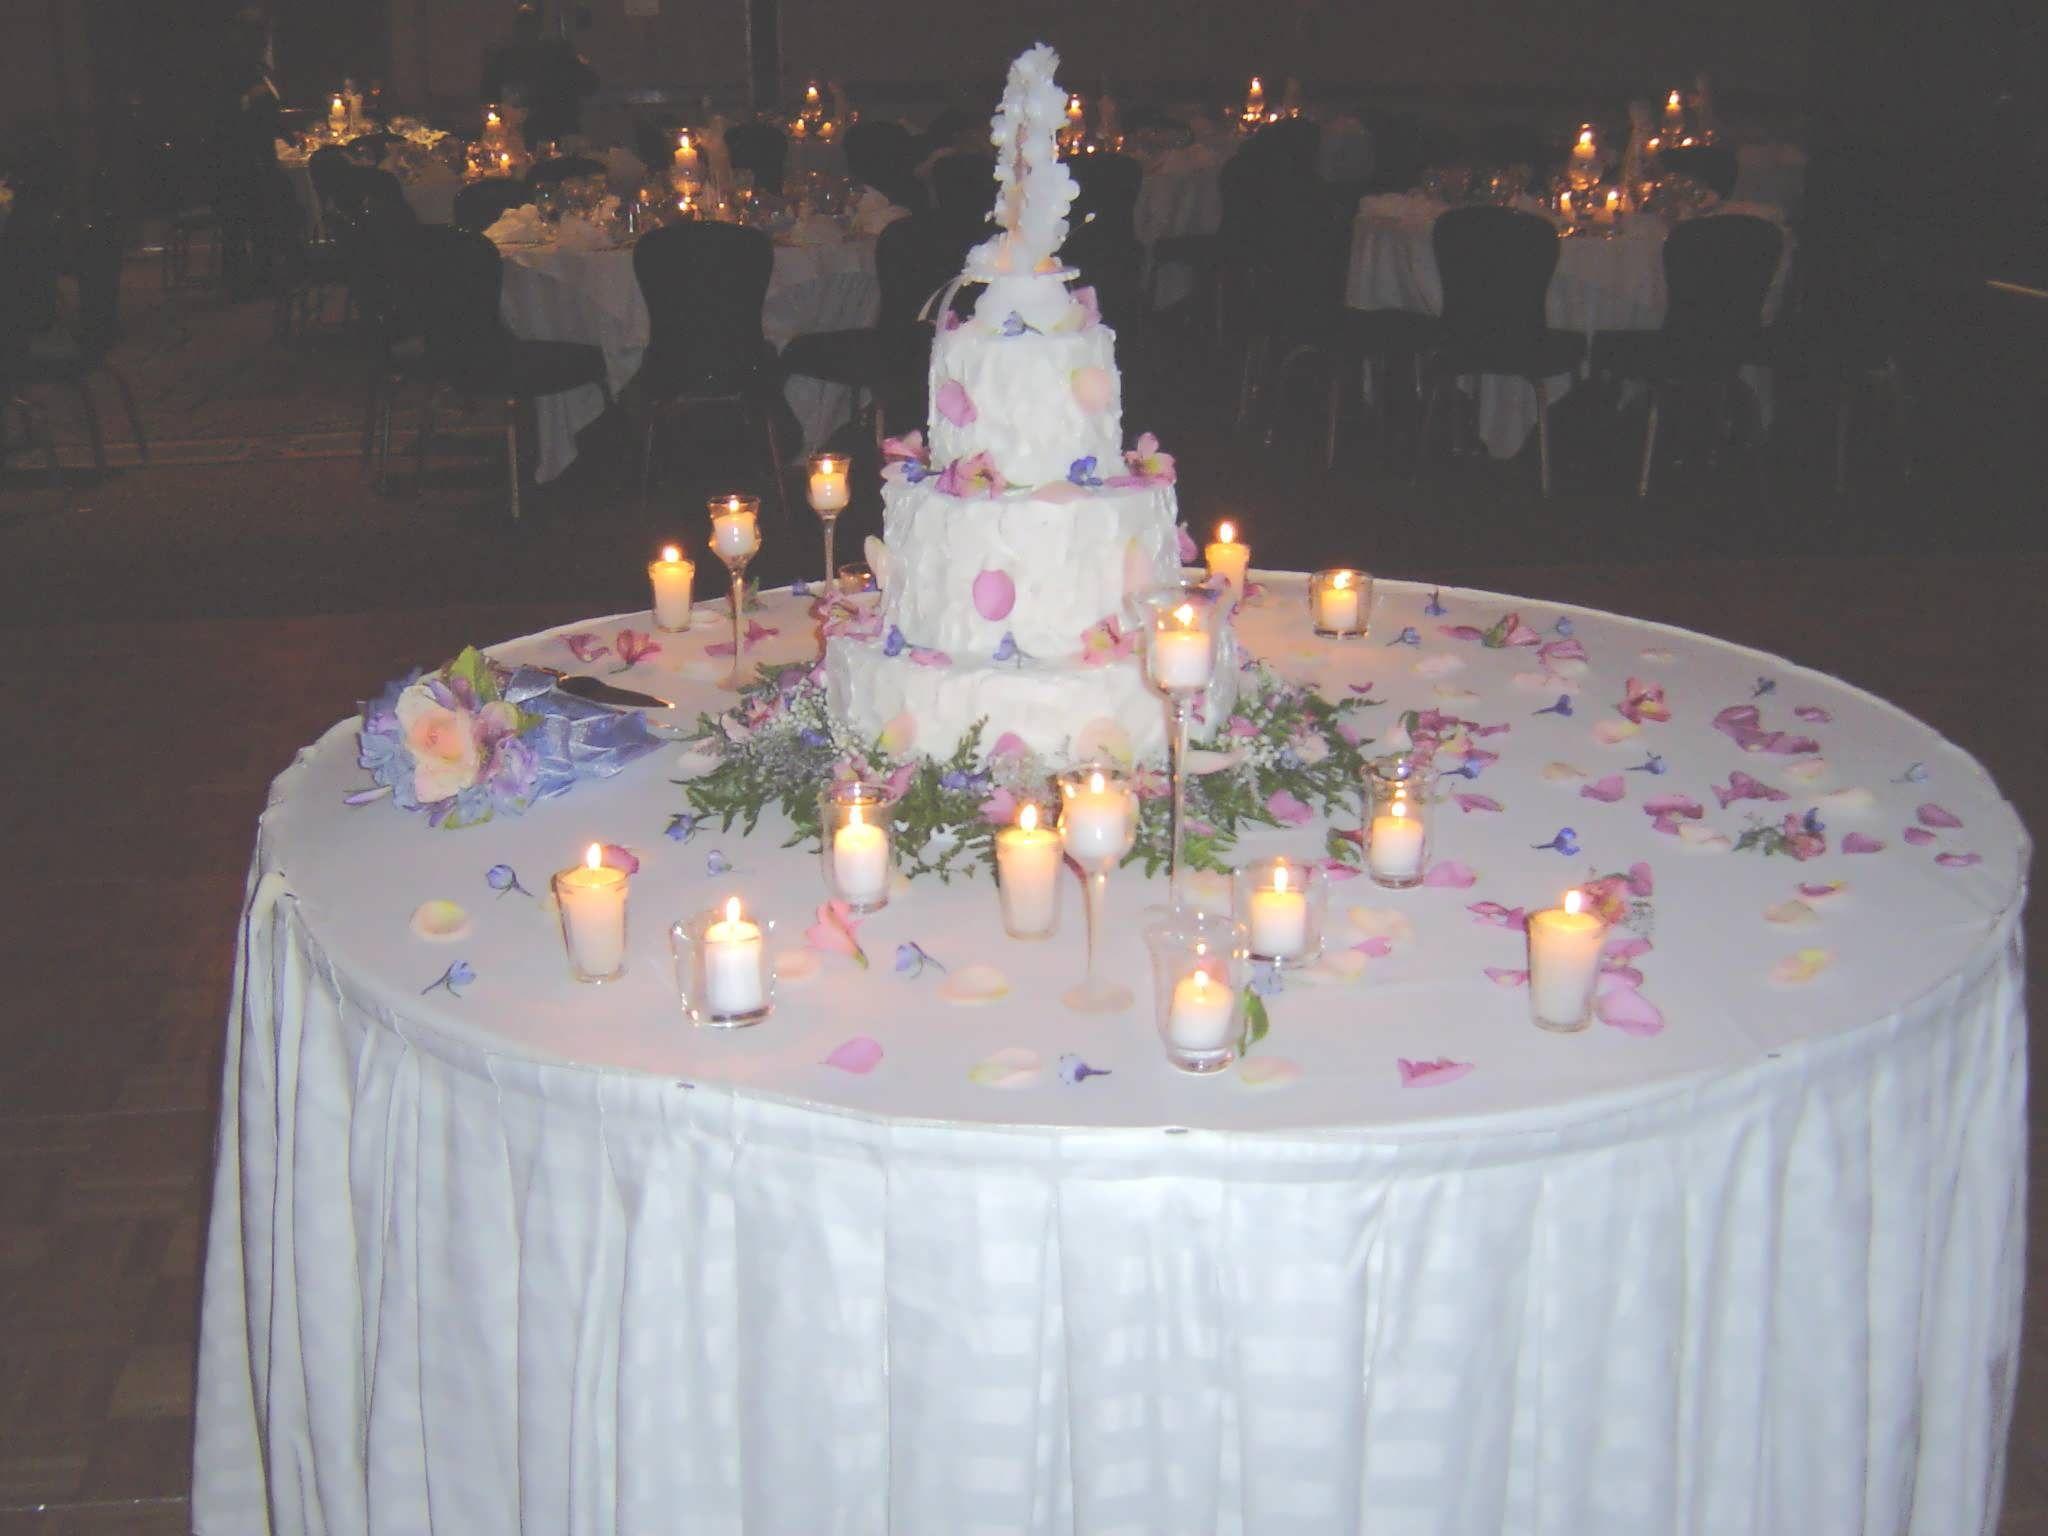 wedding decorations ideas for church included 1920 8217 s wedding